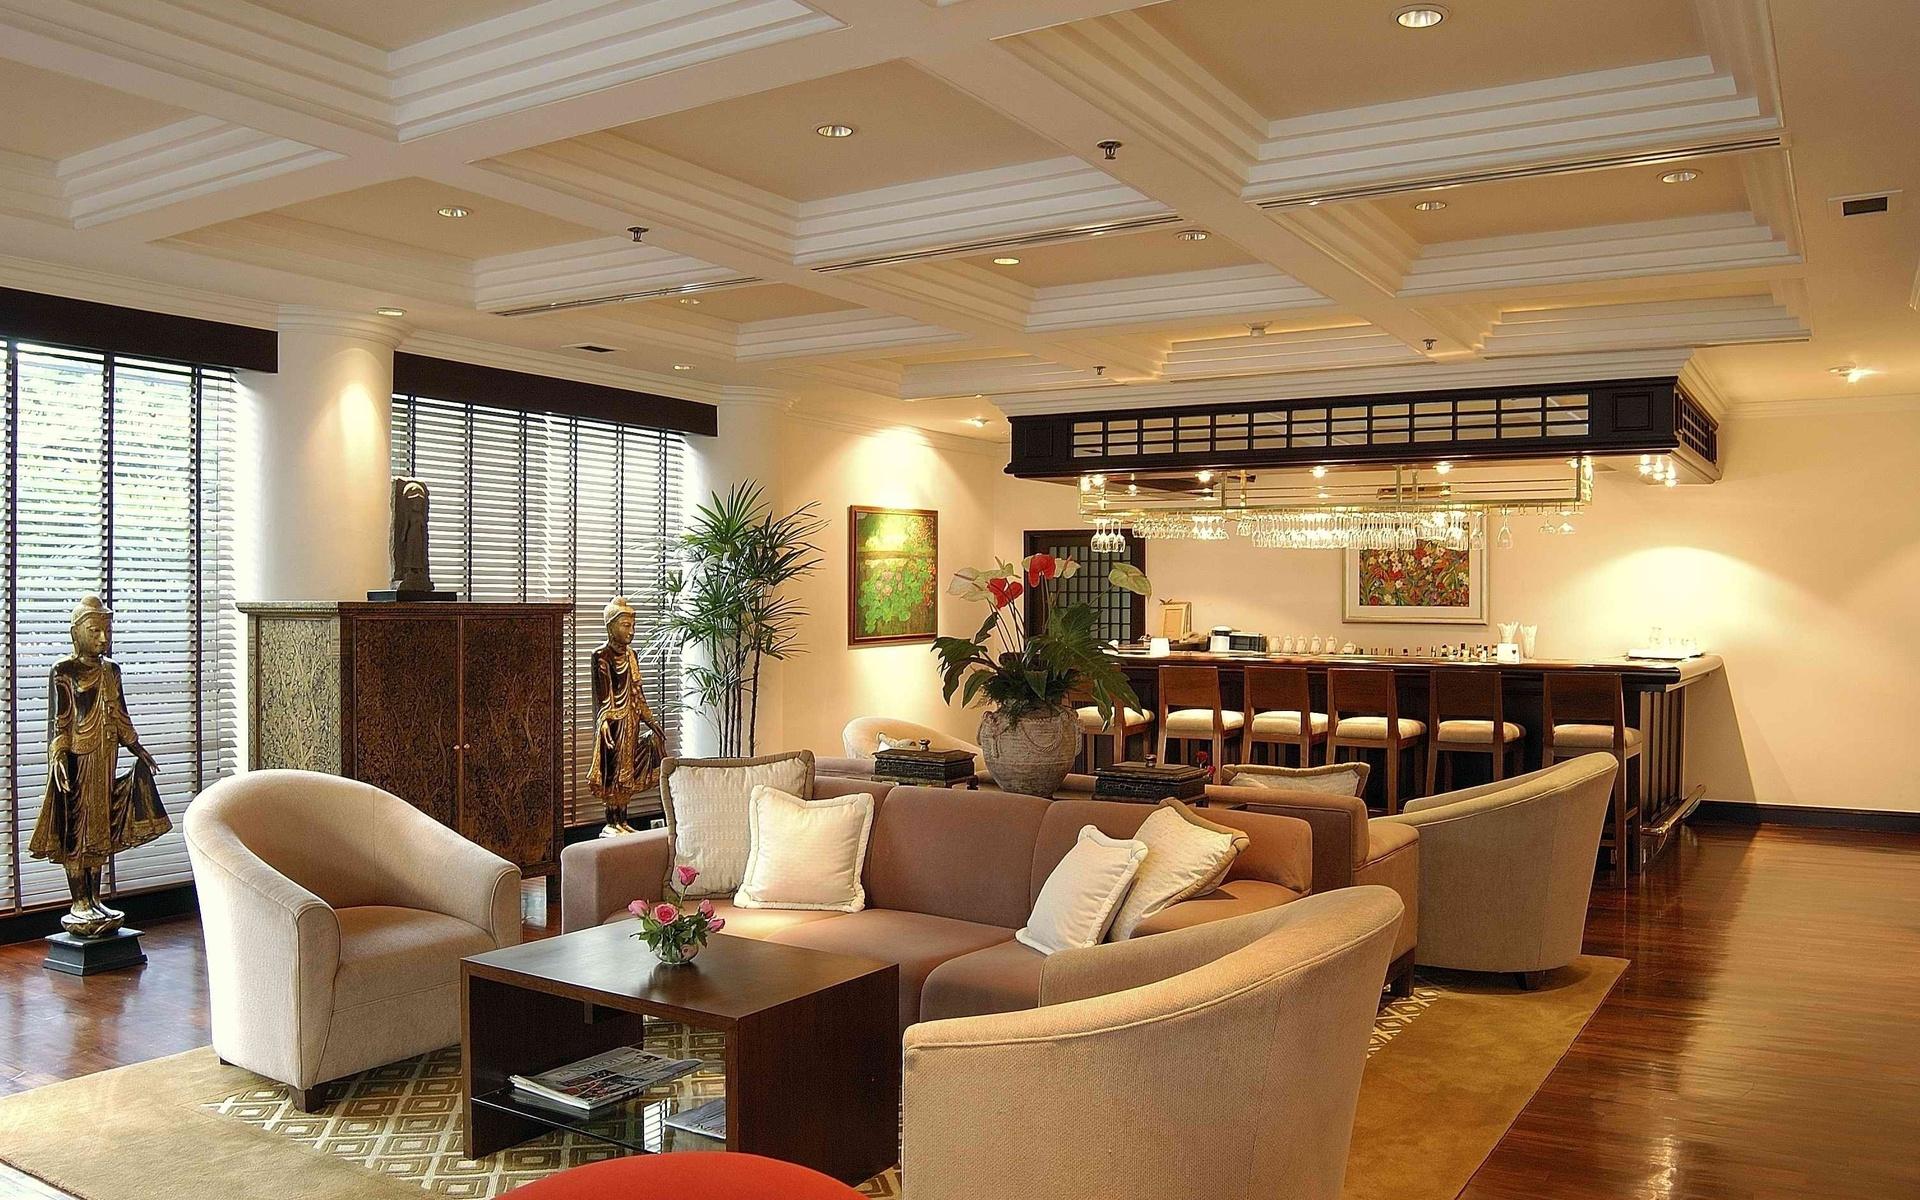 статуэтки, бар, кресла, Комната, столик, мебель, диван